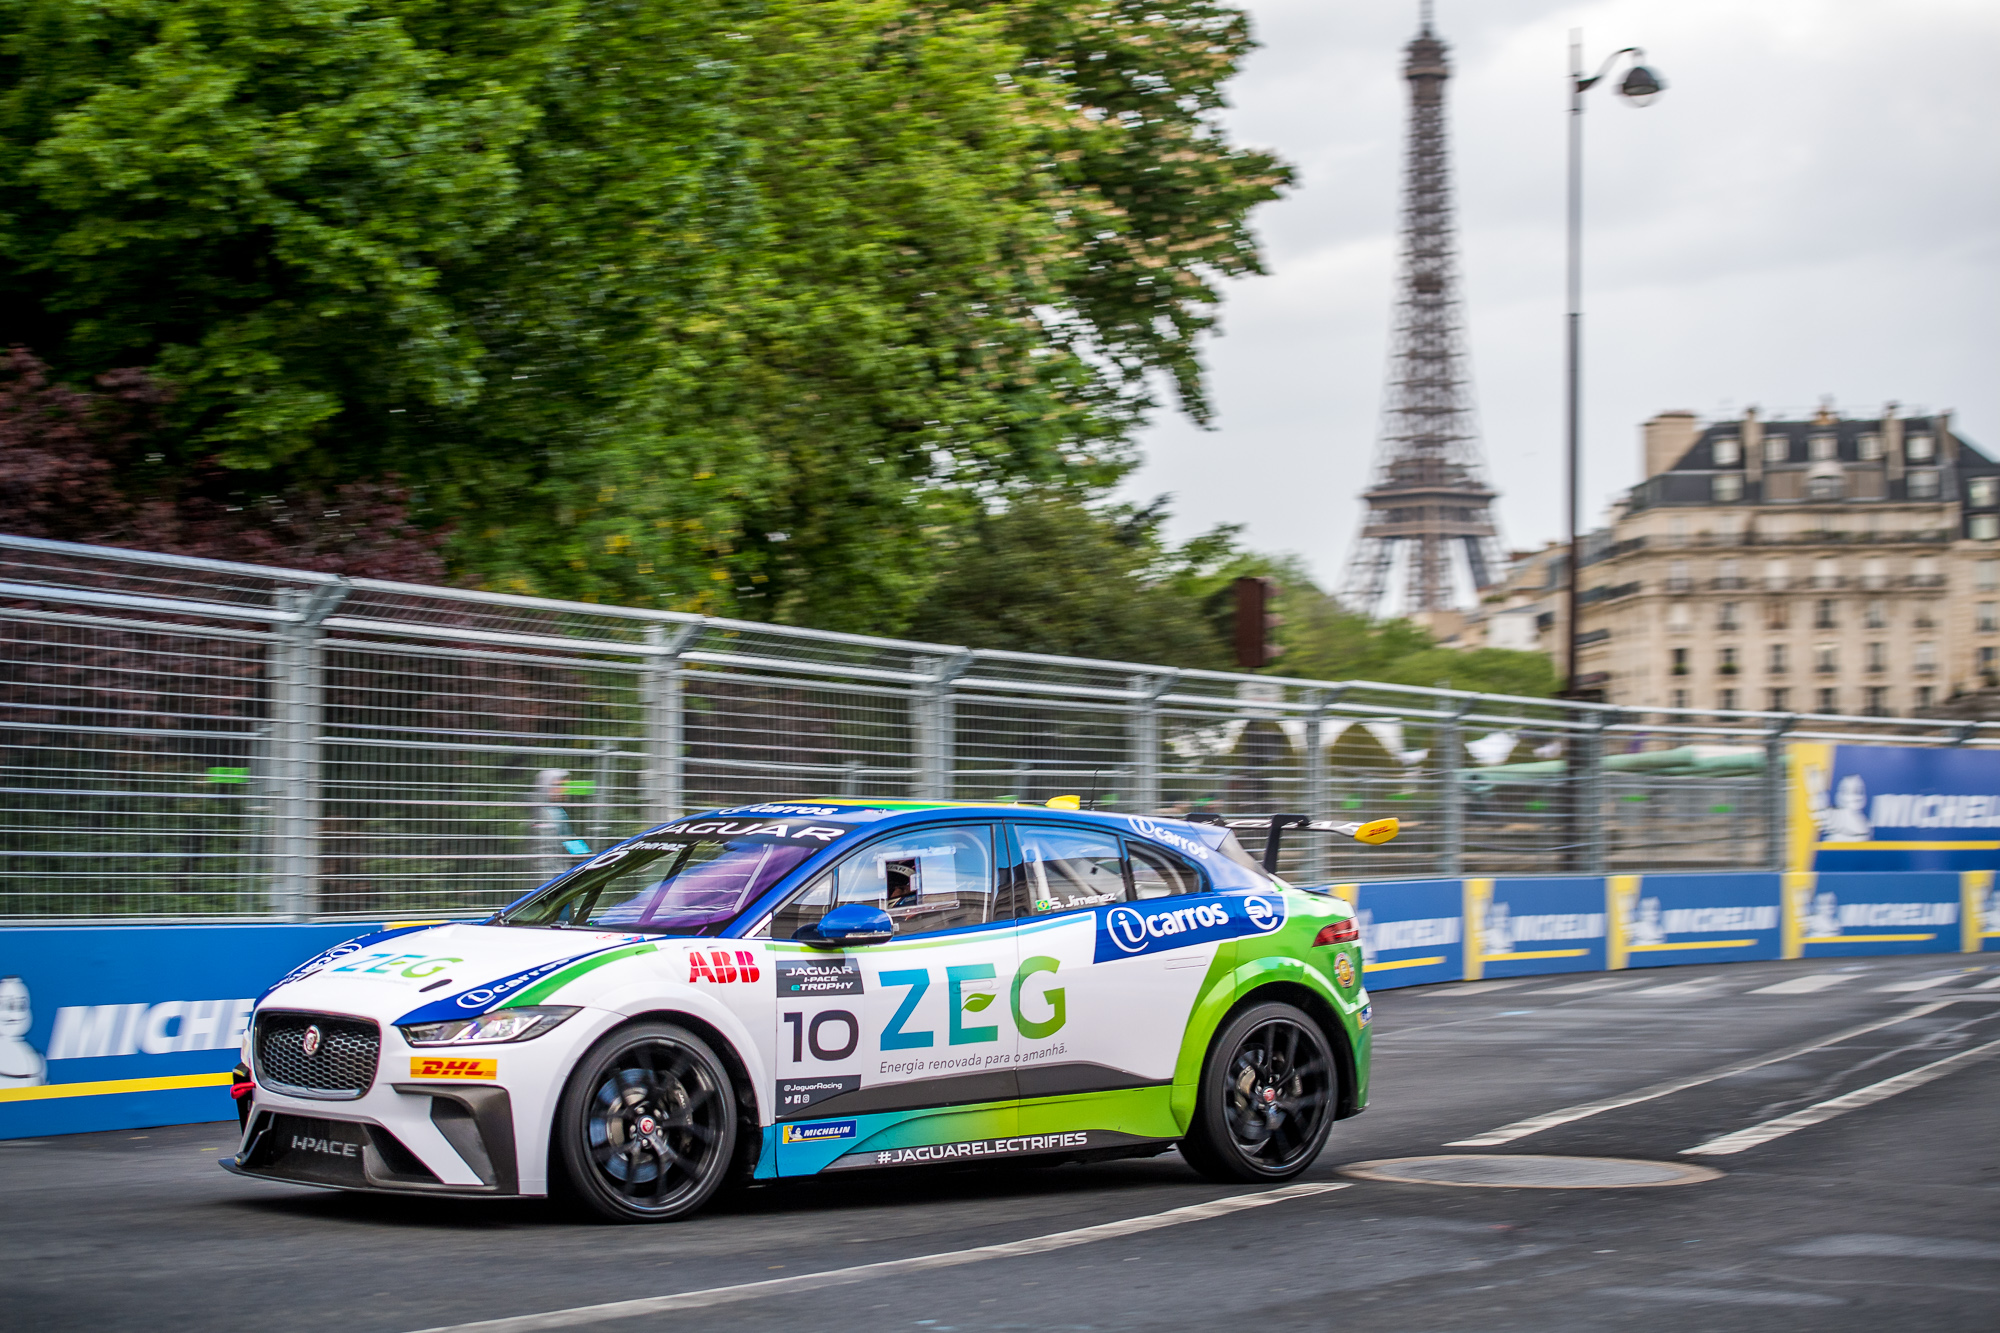 Jaguar_6.Paris_josemariodias_06002